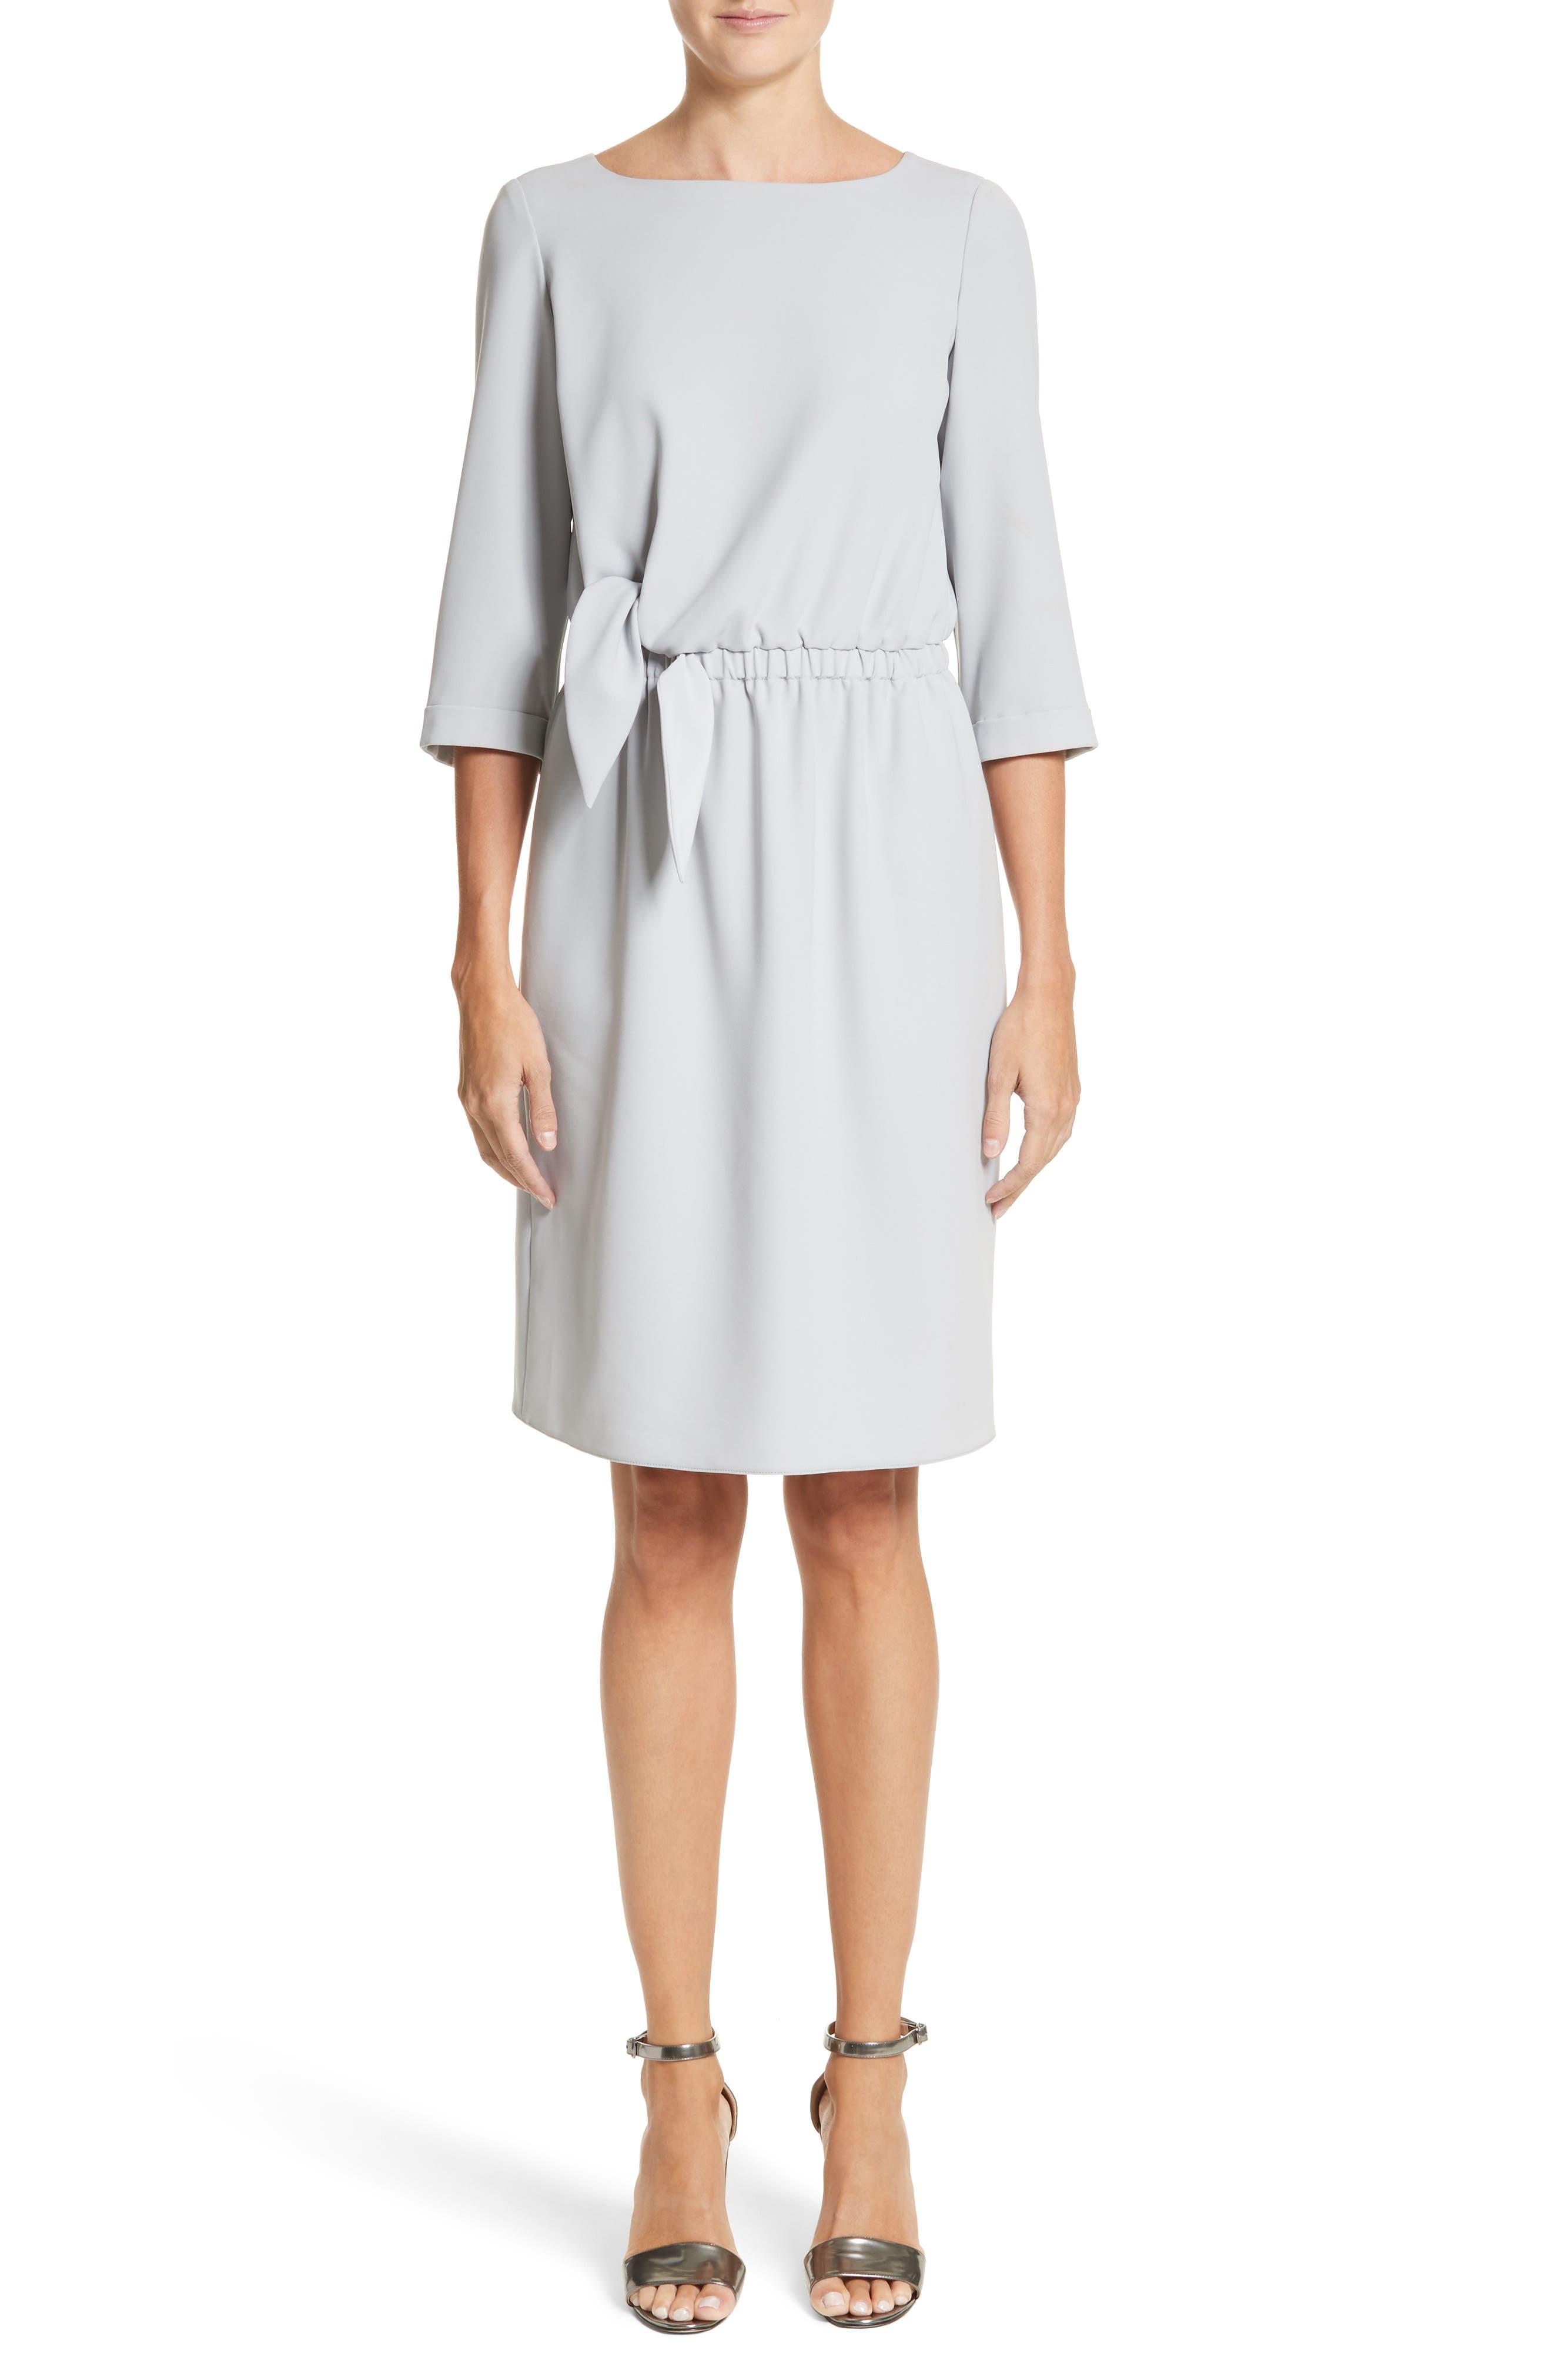 Emporio Armani Cady Tie Waist Dress